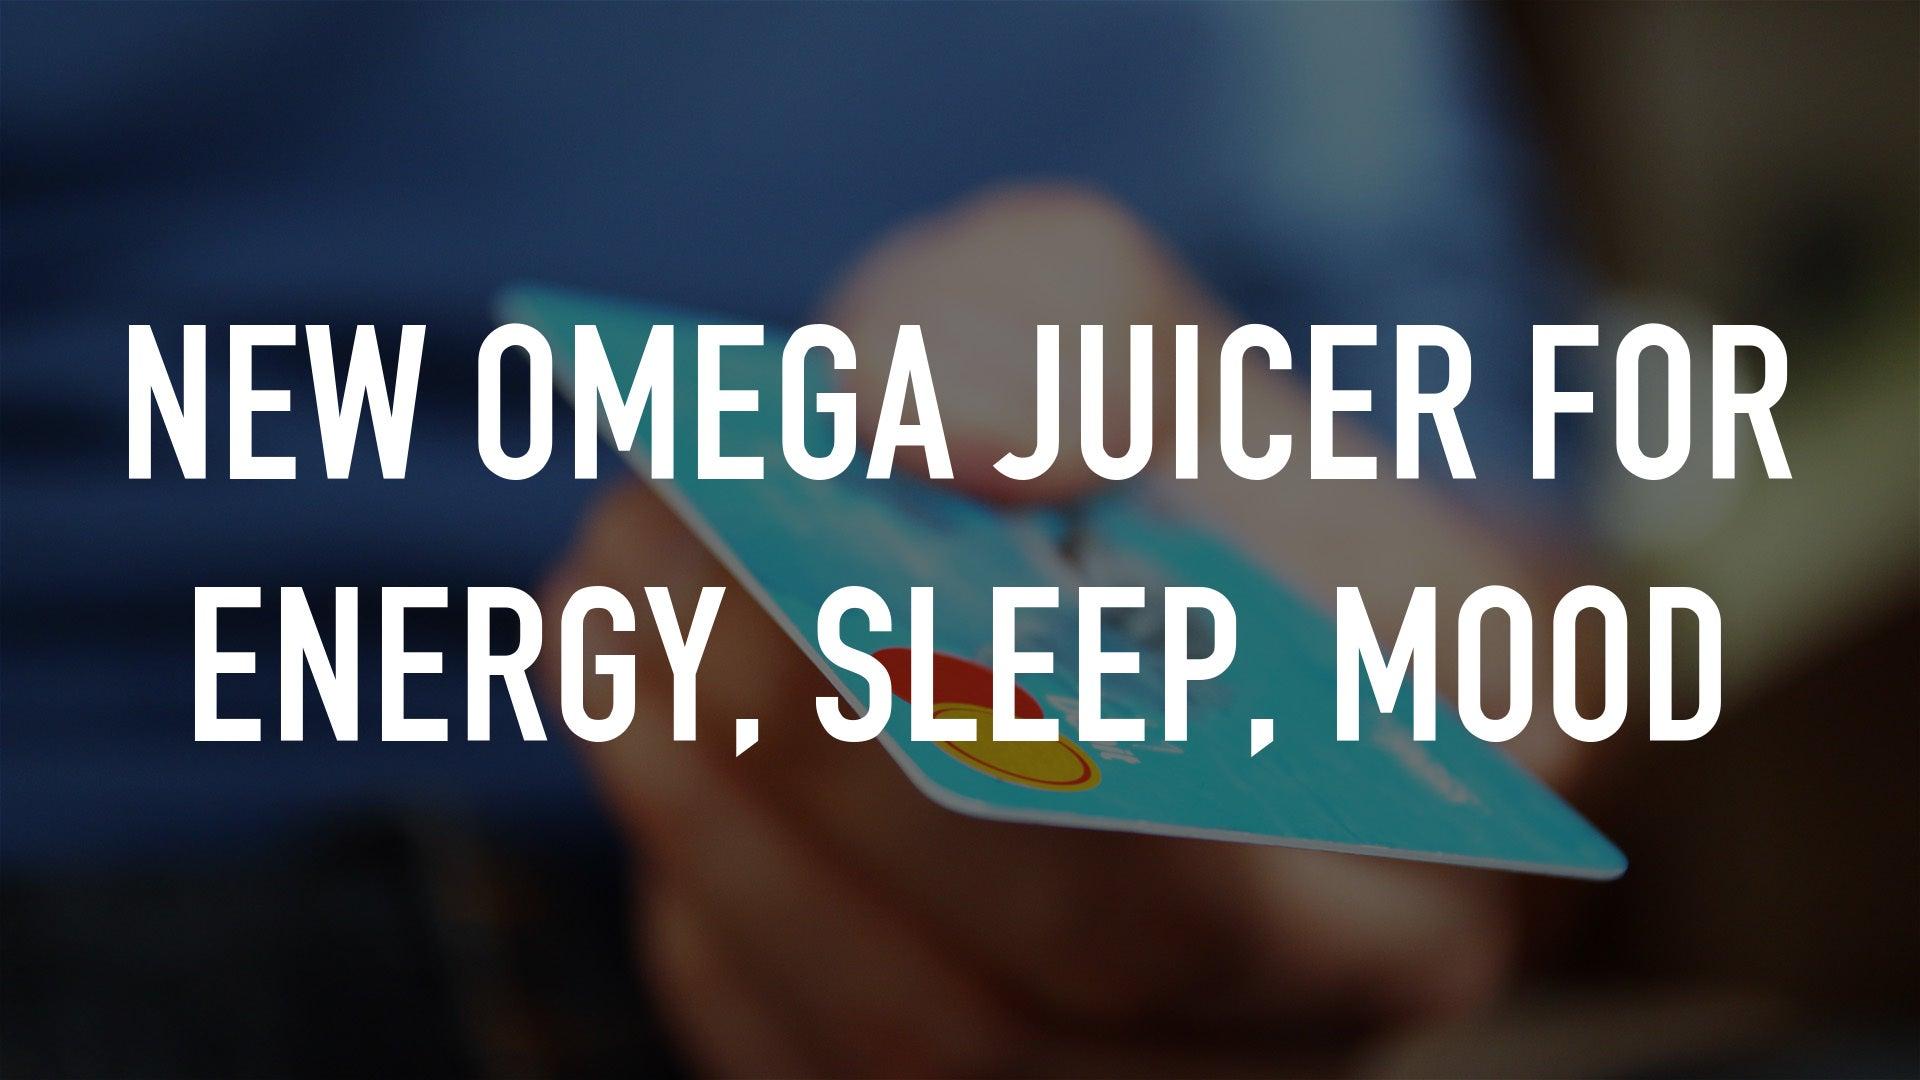 New Omega Juicer for Energy, Sleep, Mood